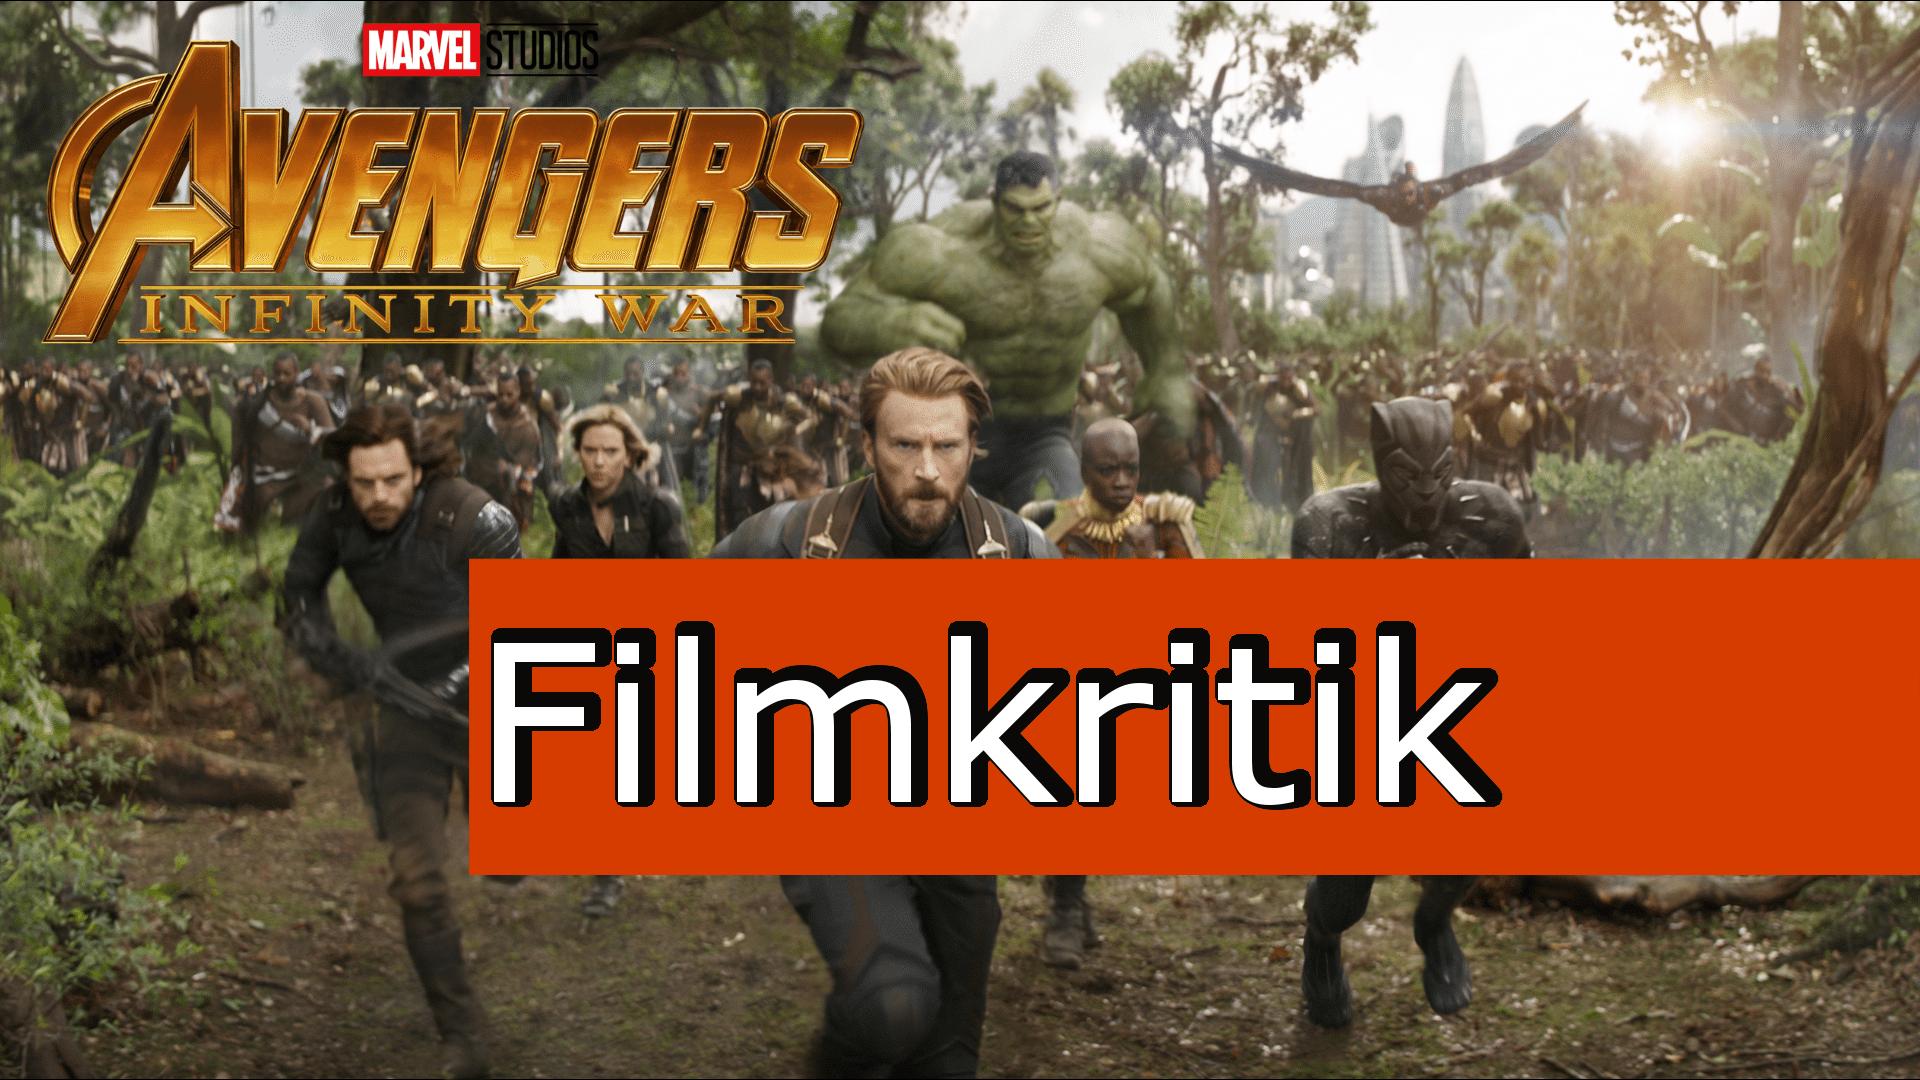 Filmkritik – Avengers: Infinity War